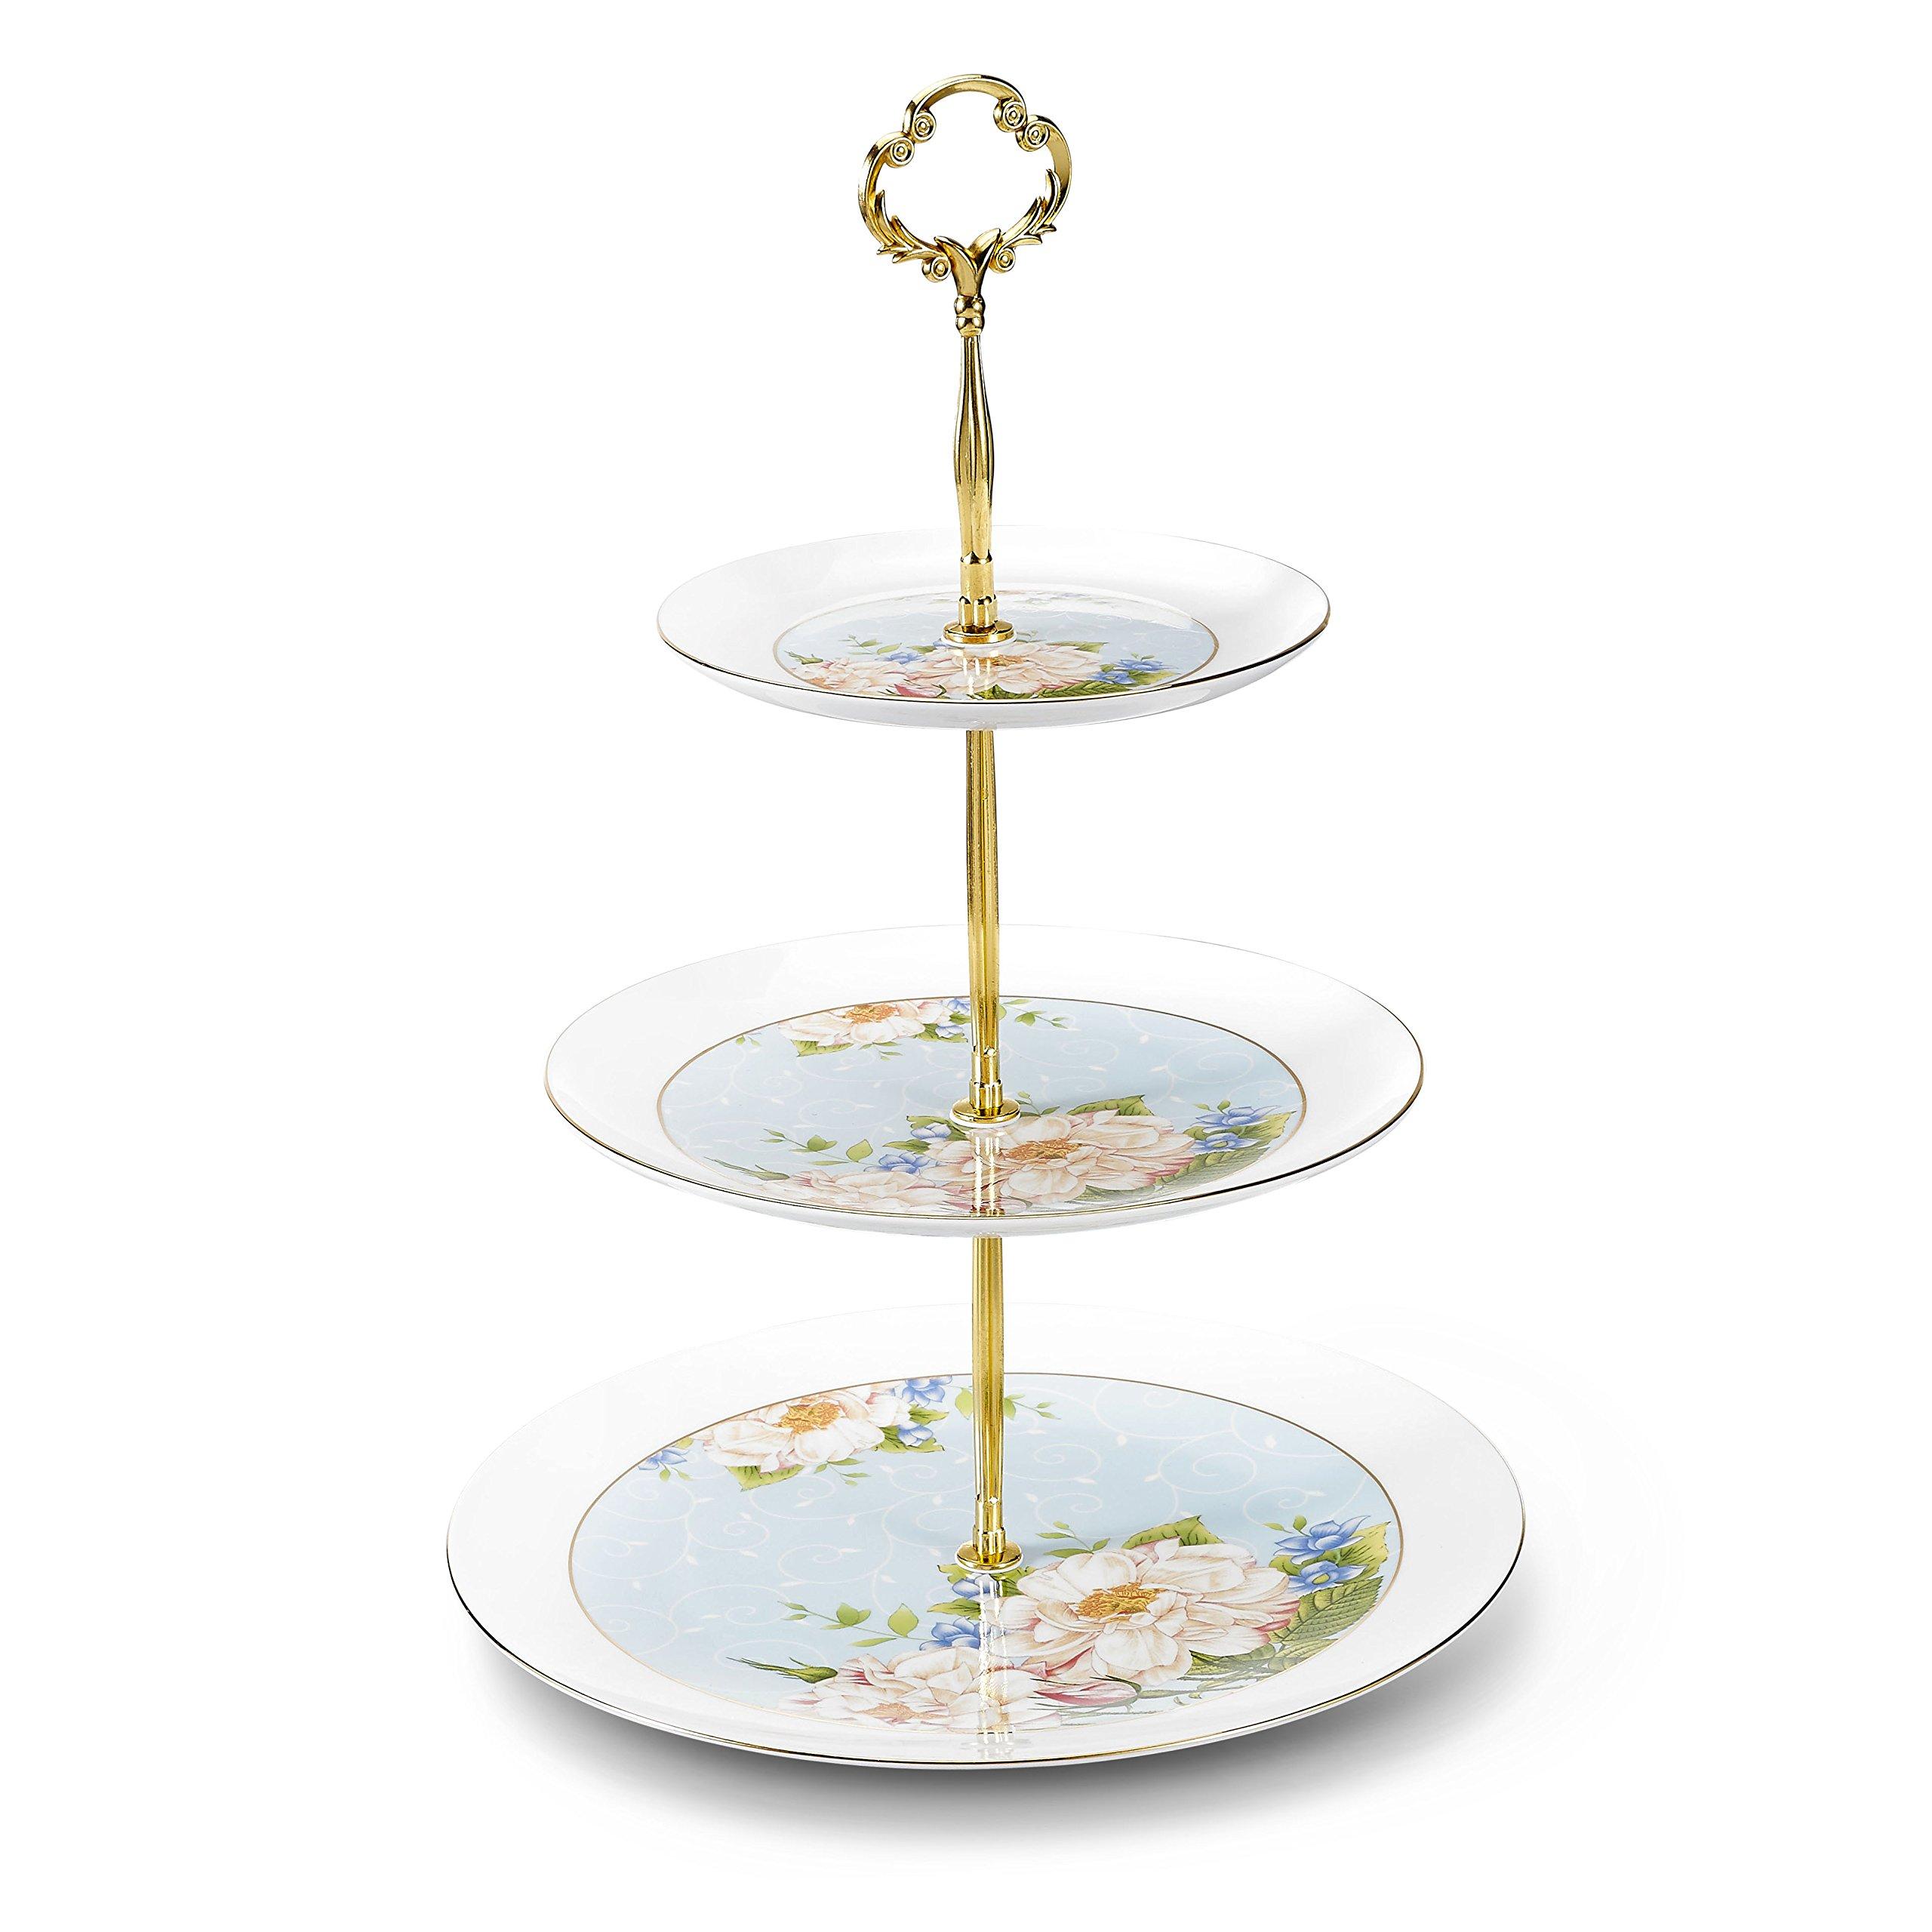 Panbado 3 Tier Cake Stand Tower, Bone China 6'' /8''/10'' Party Food Server Display Set - Light Blue Flower